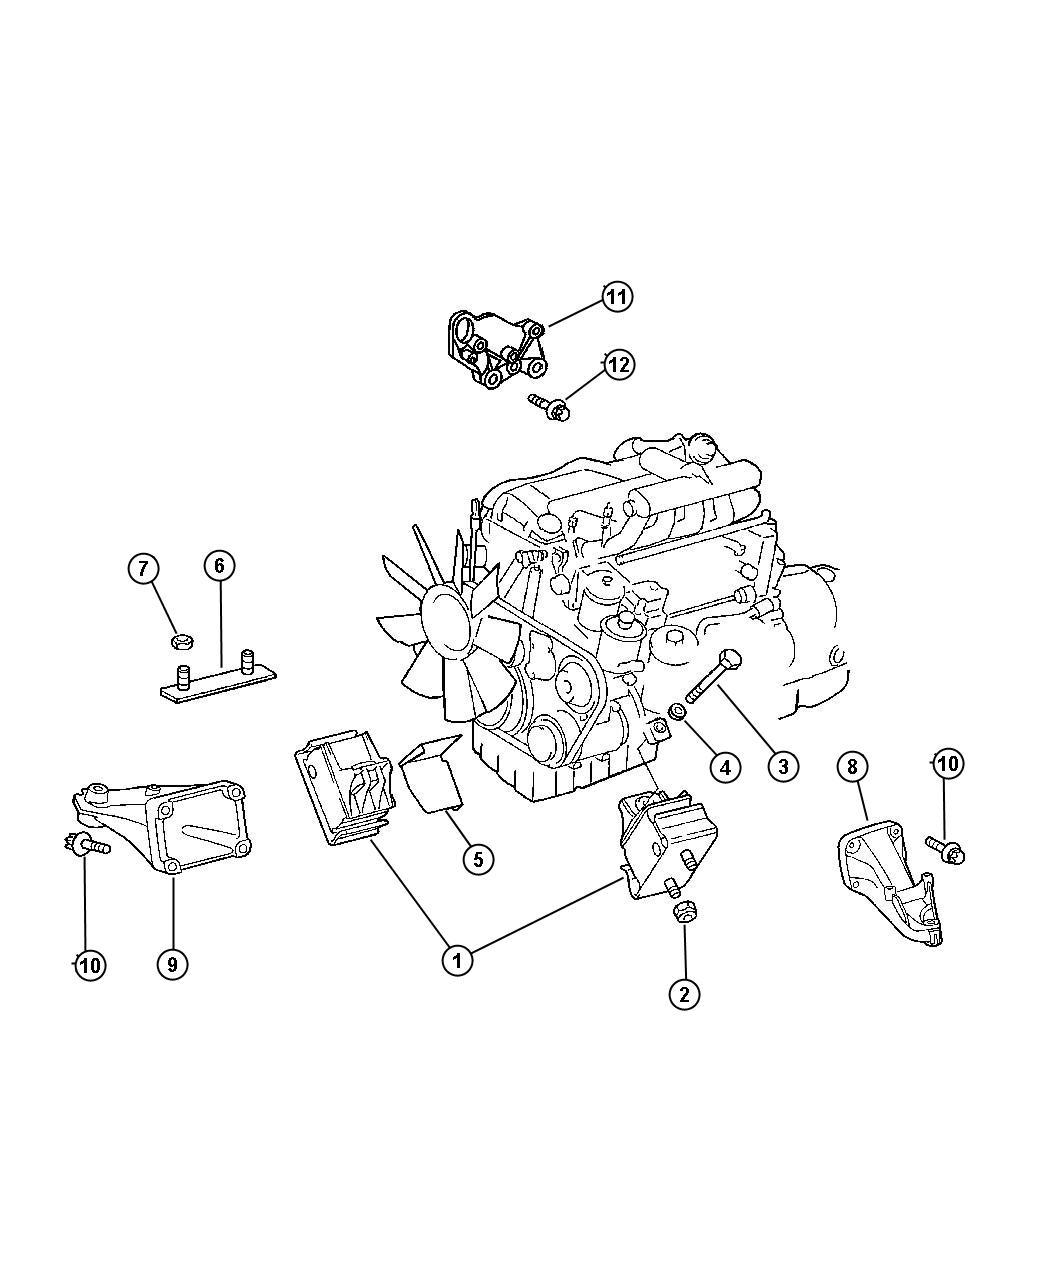 Dodge Sprinter 2500 Shield. Engine mount. Mercedes, turbo